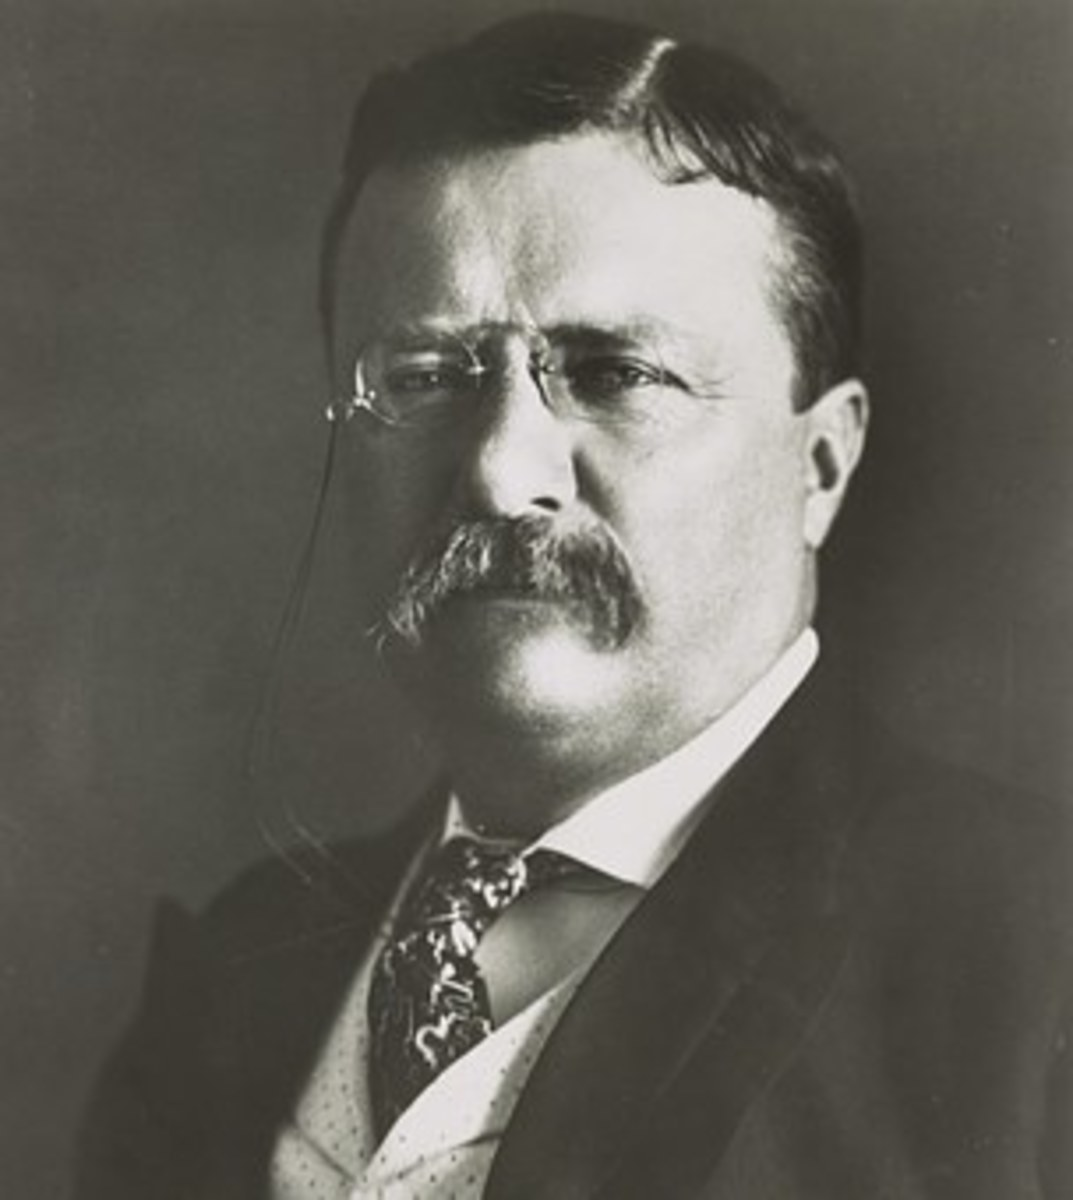 President Theodore Roosevelt, 26th U.S. President